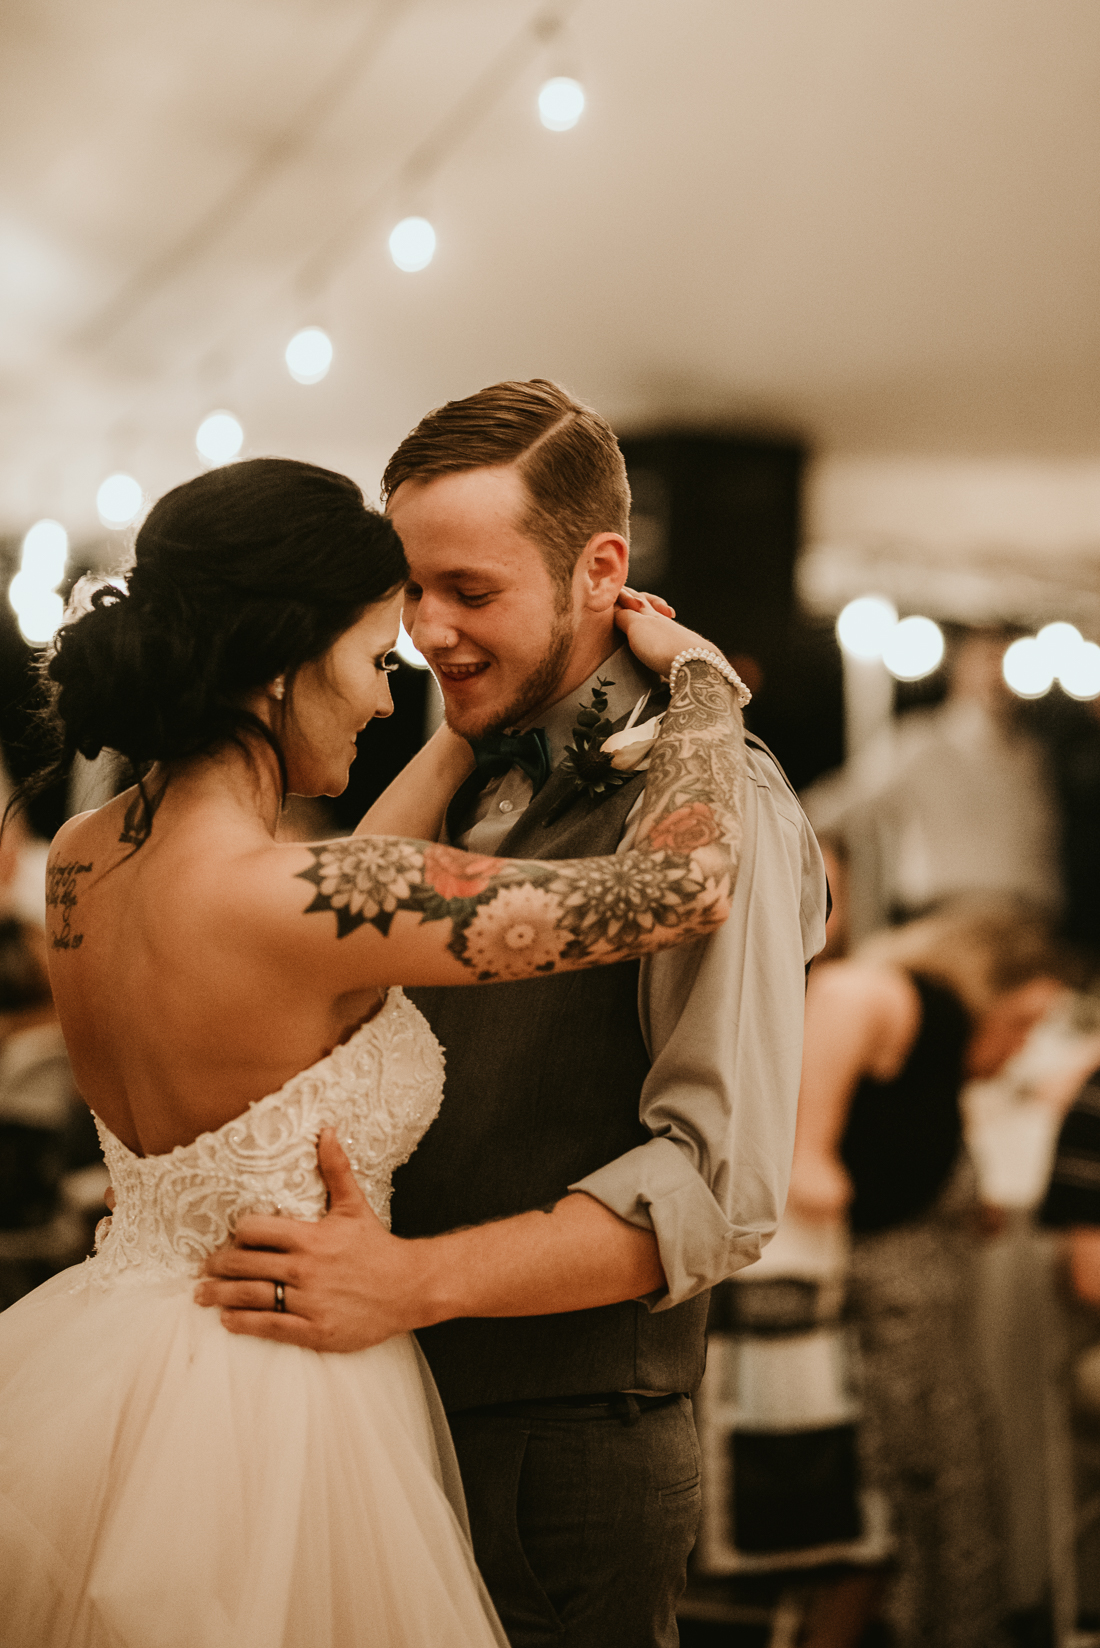 olivia_zay_wedding_09_2018-7878.jpg